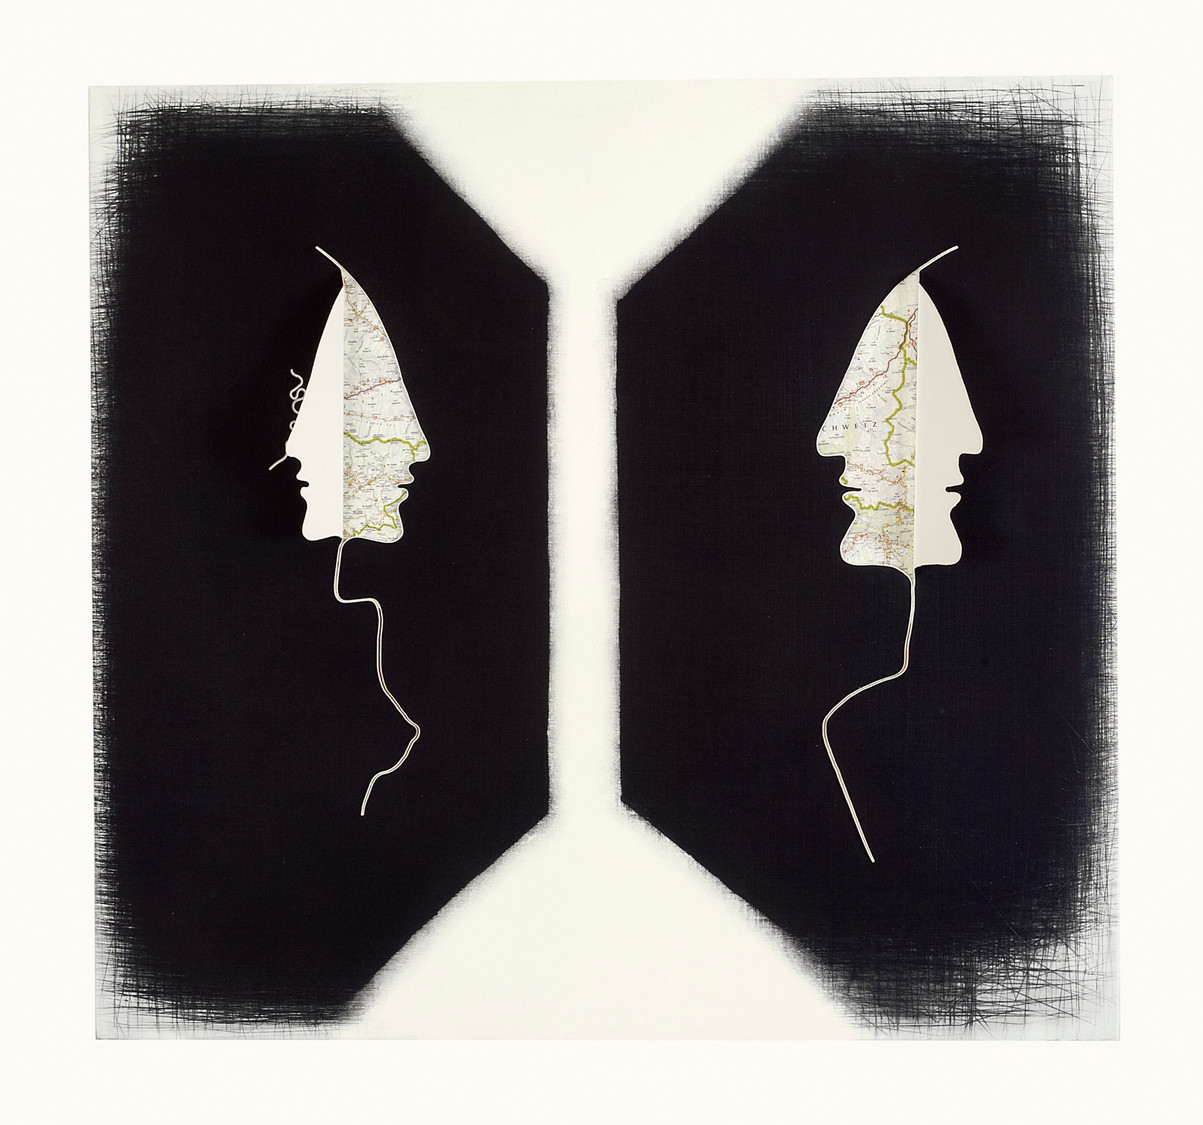 Dialogo assente - 110 x 115 cm